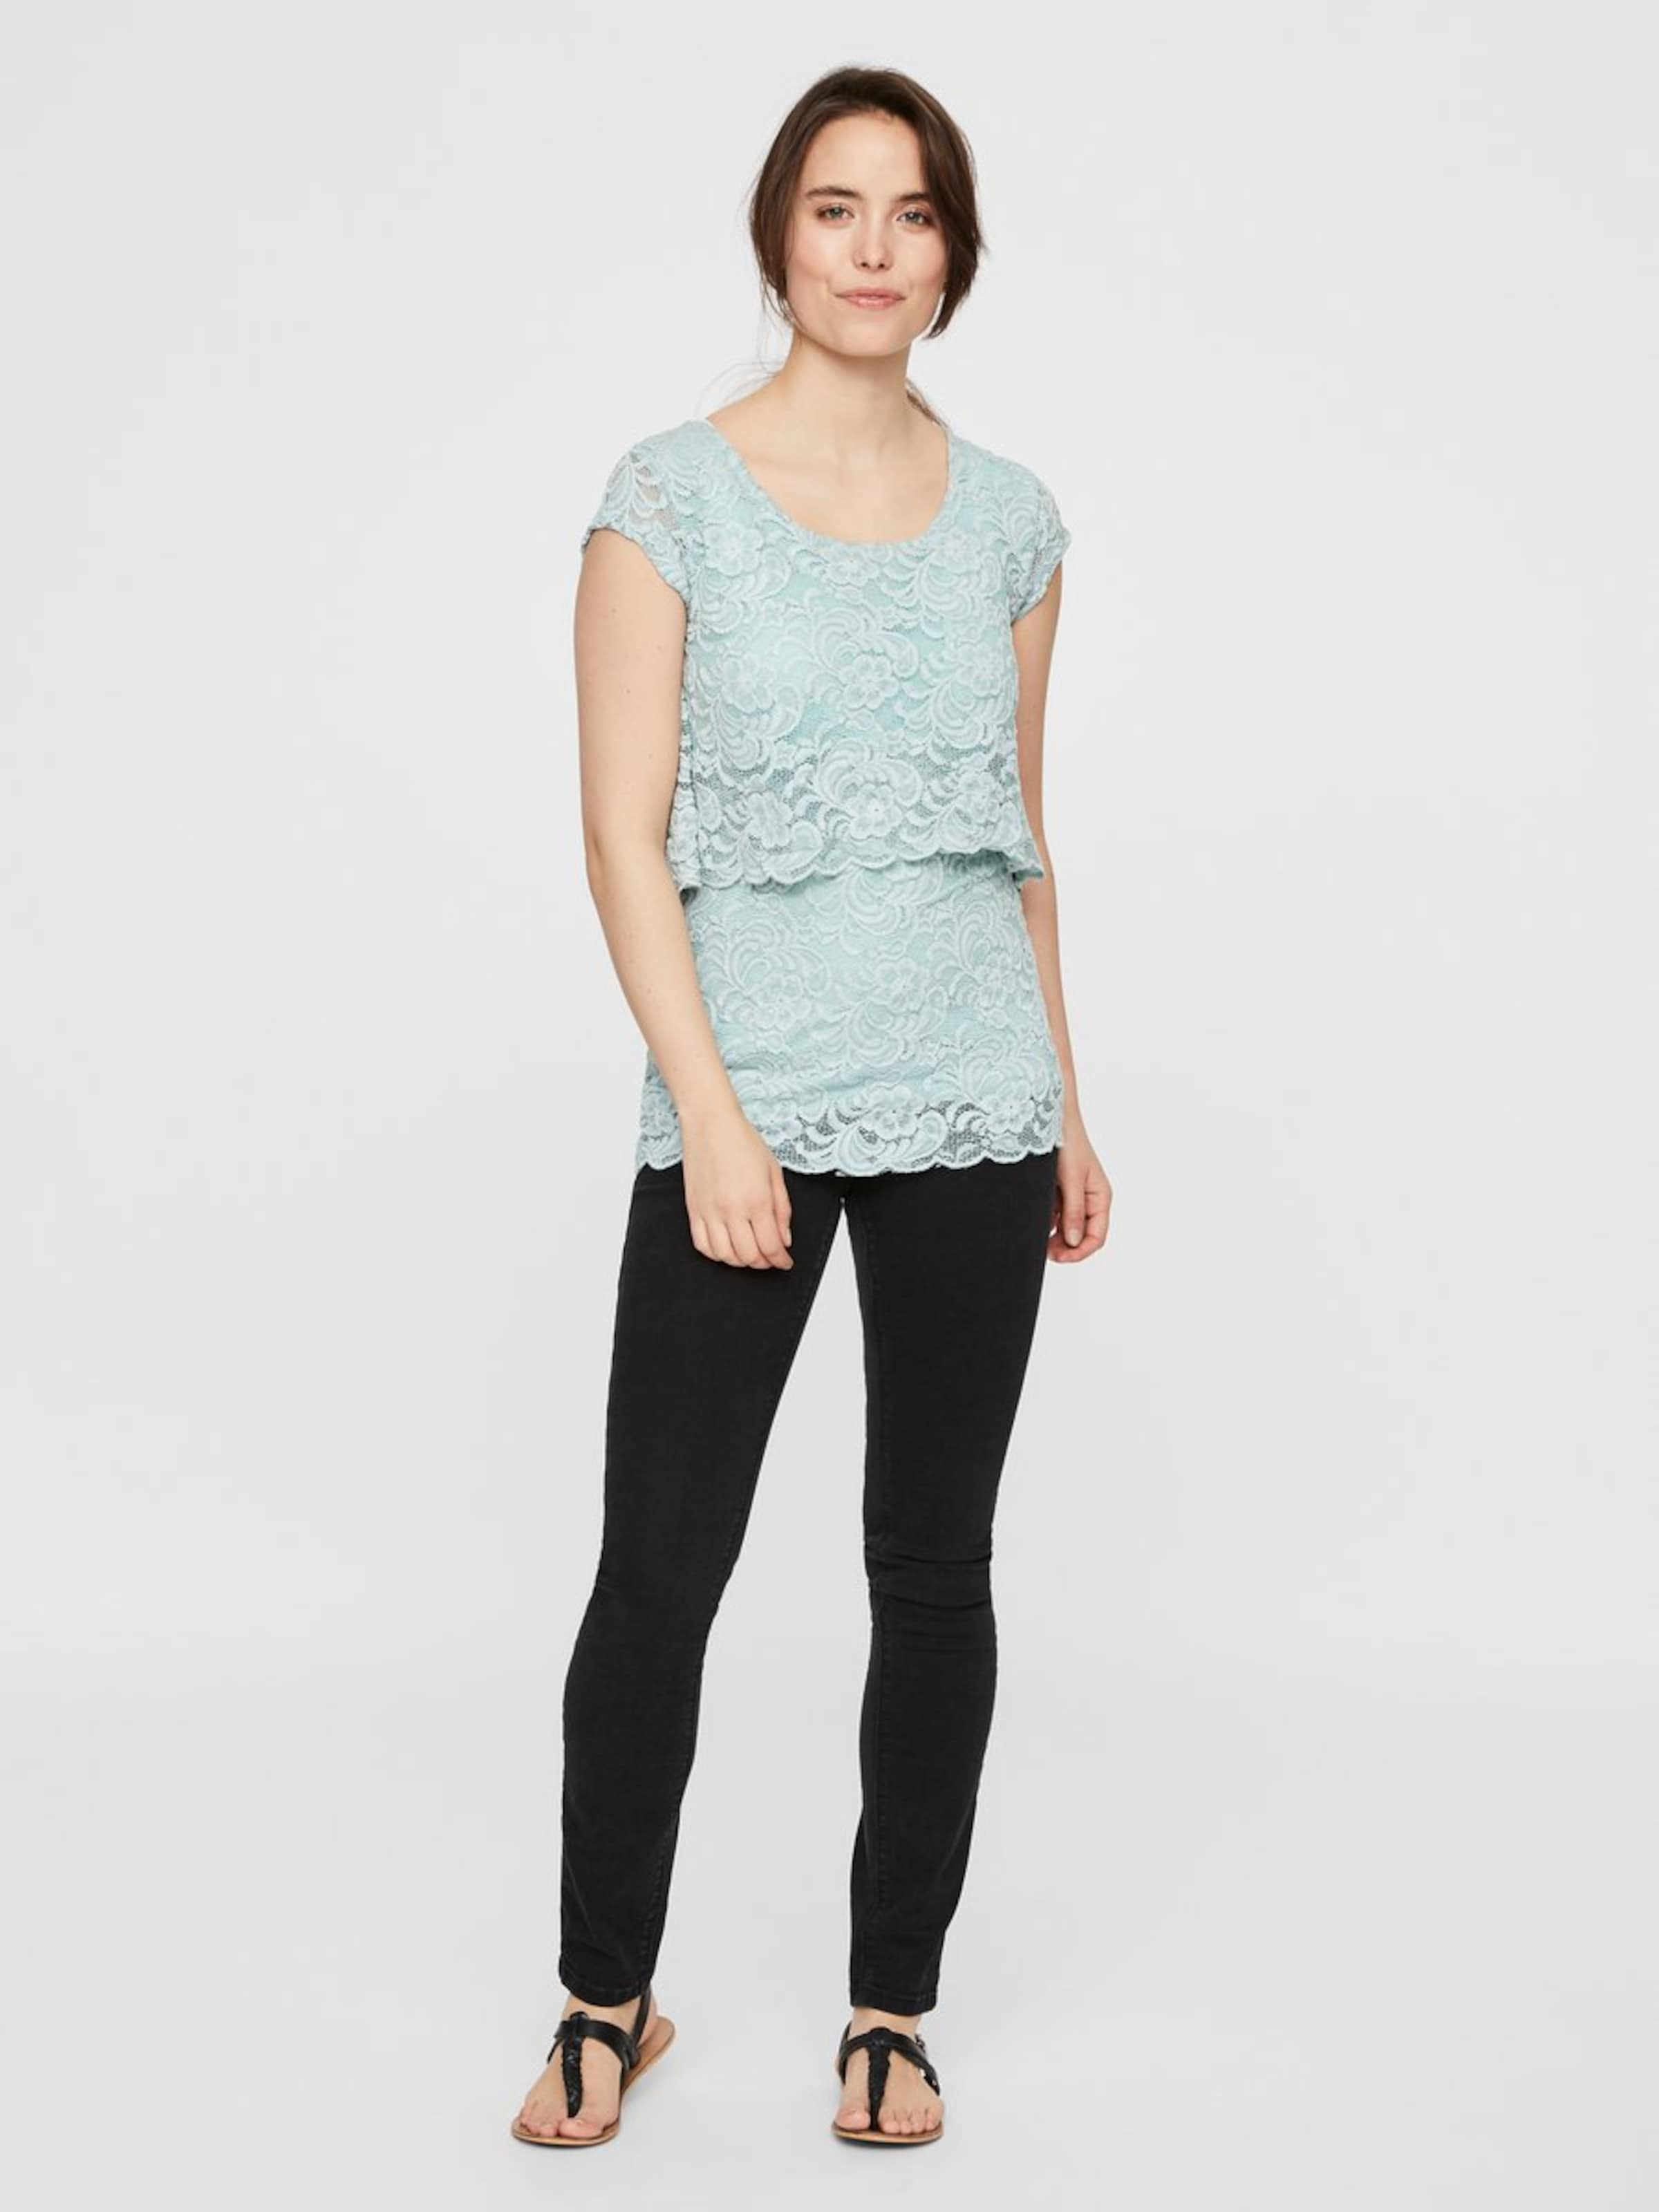 Opal T Mamalicious 'mivane' shirt En y7bg6vfY